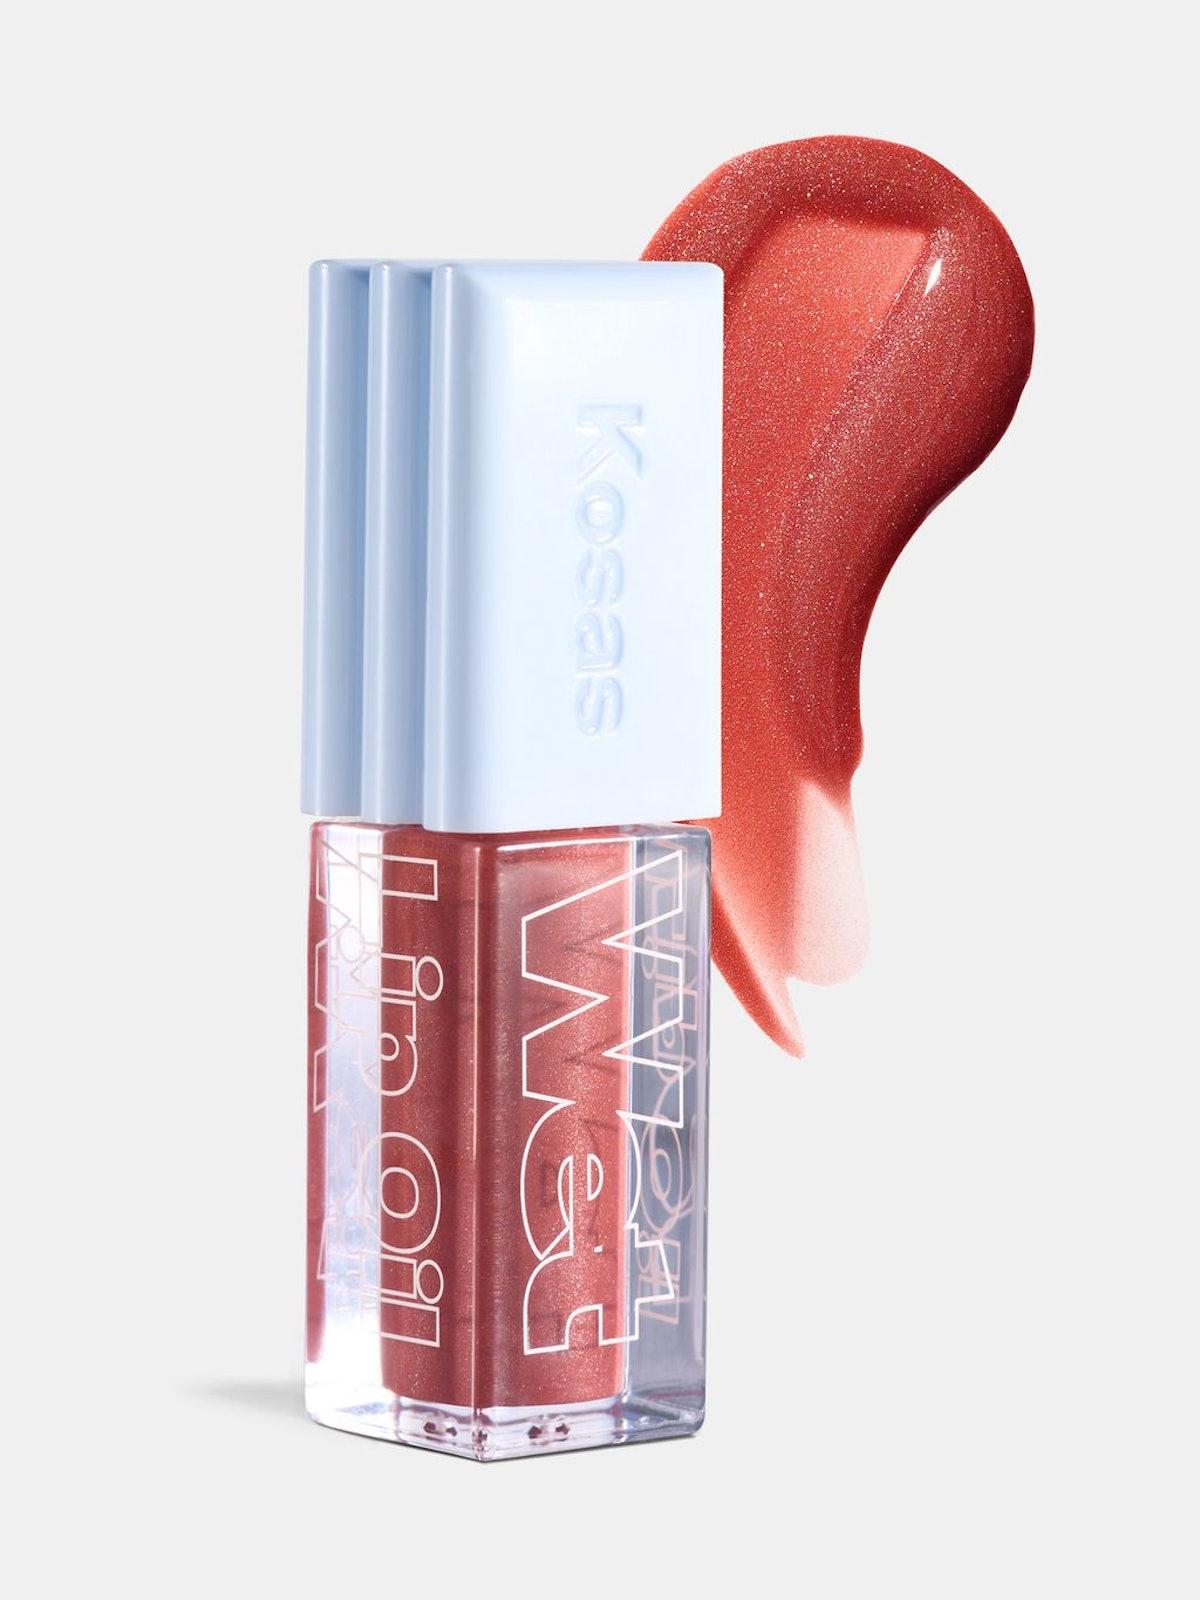 Wet Lip Oil Gloss: additional image